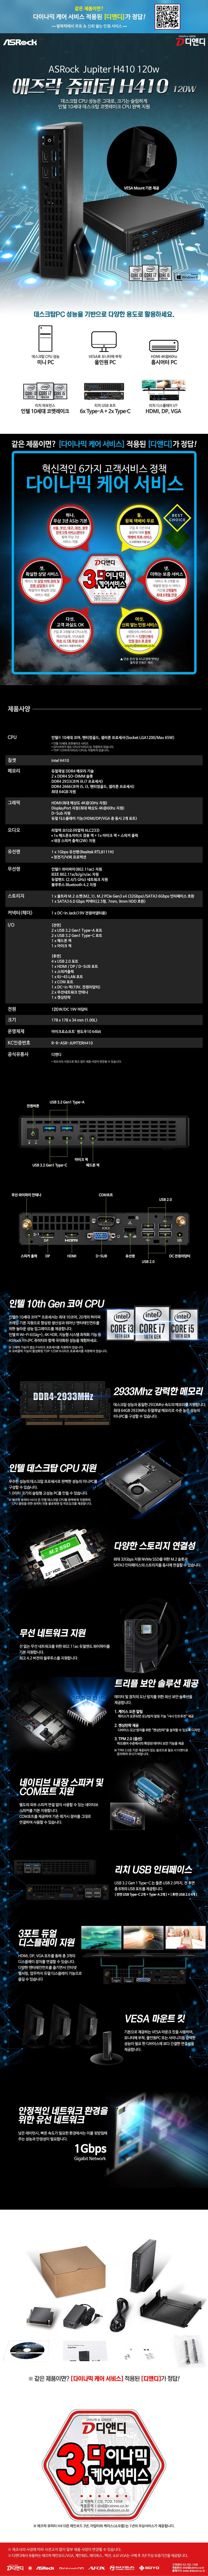 ASRock Jupiter H410 i3-10100 120W 디앤디컴 (32GB, M2 256GB)